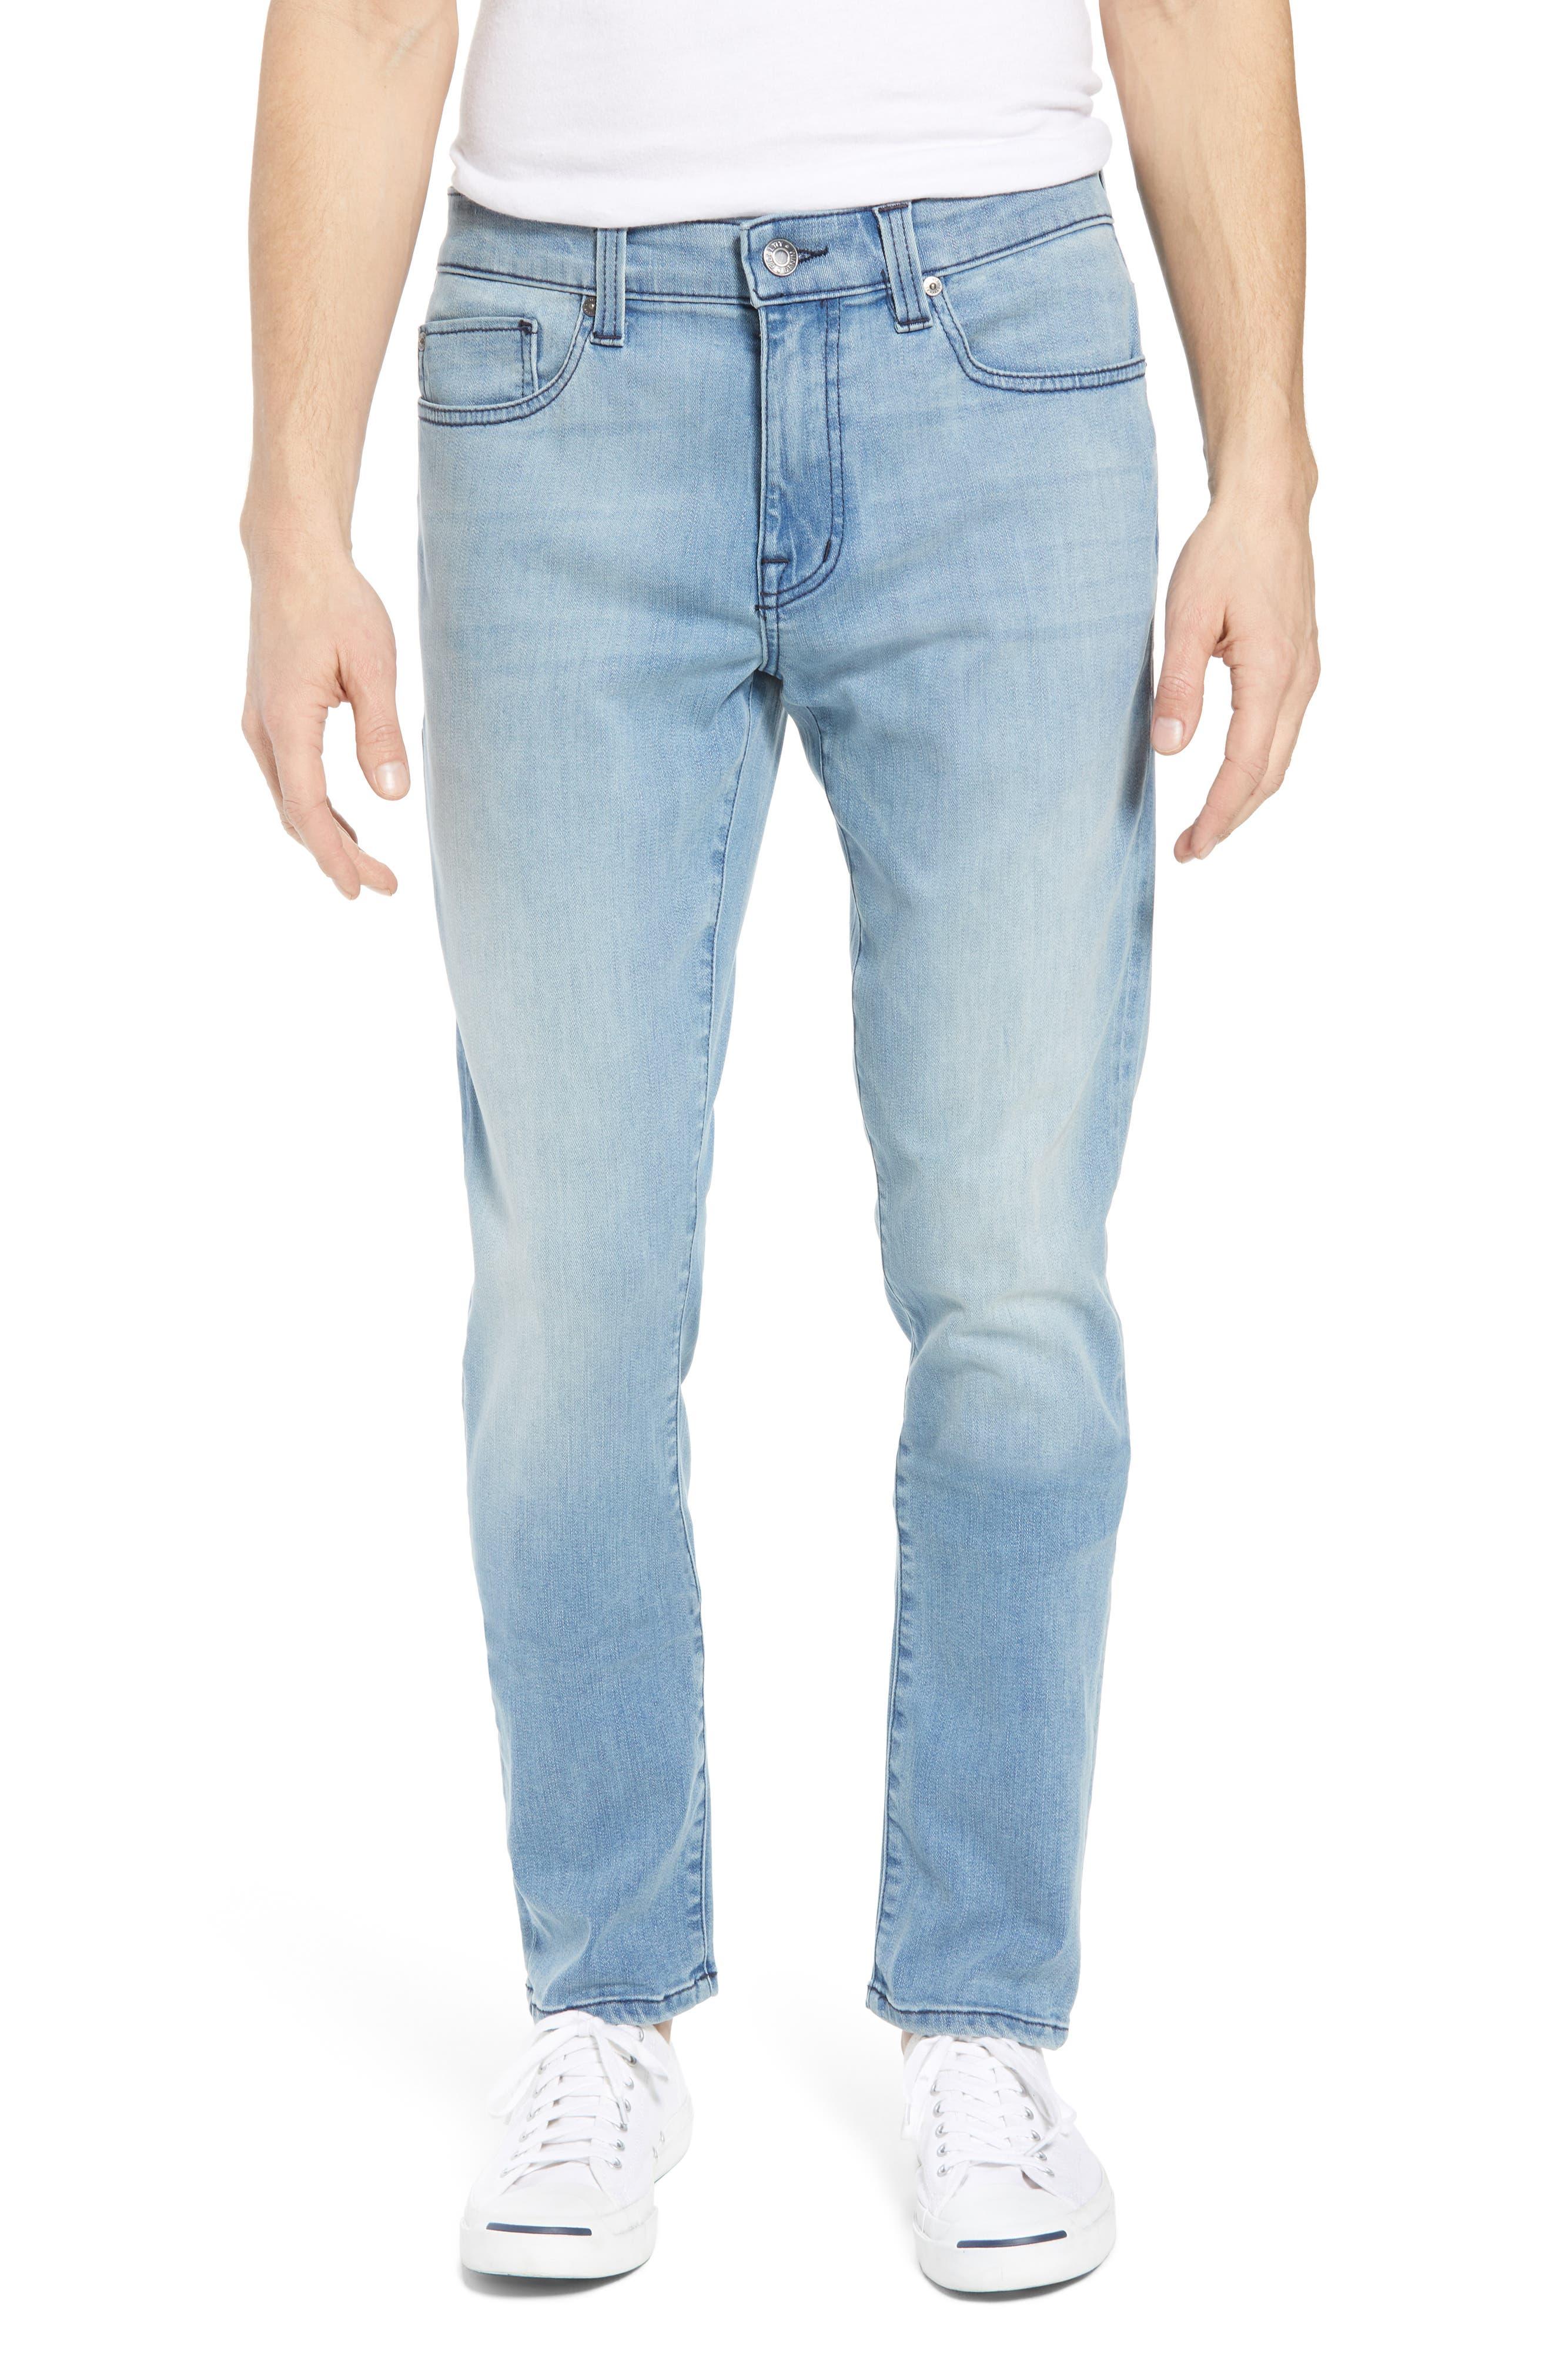 Torino Slim Fit Jeans,                             Main thumbnail 1, color,                             Abbey Blue